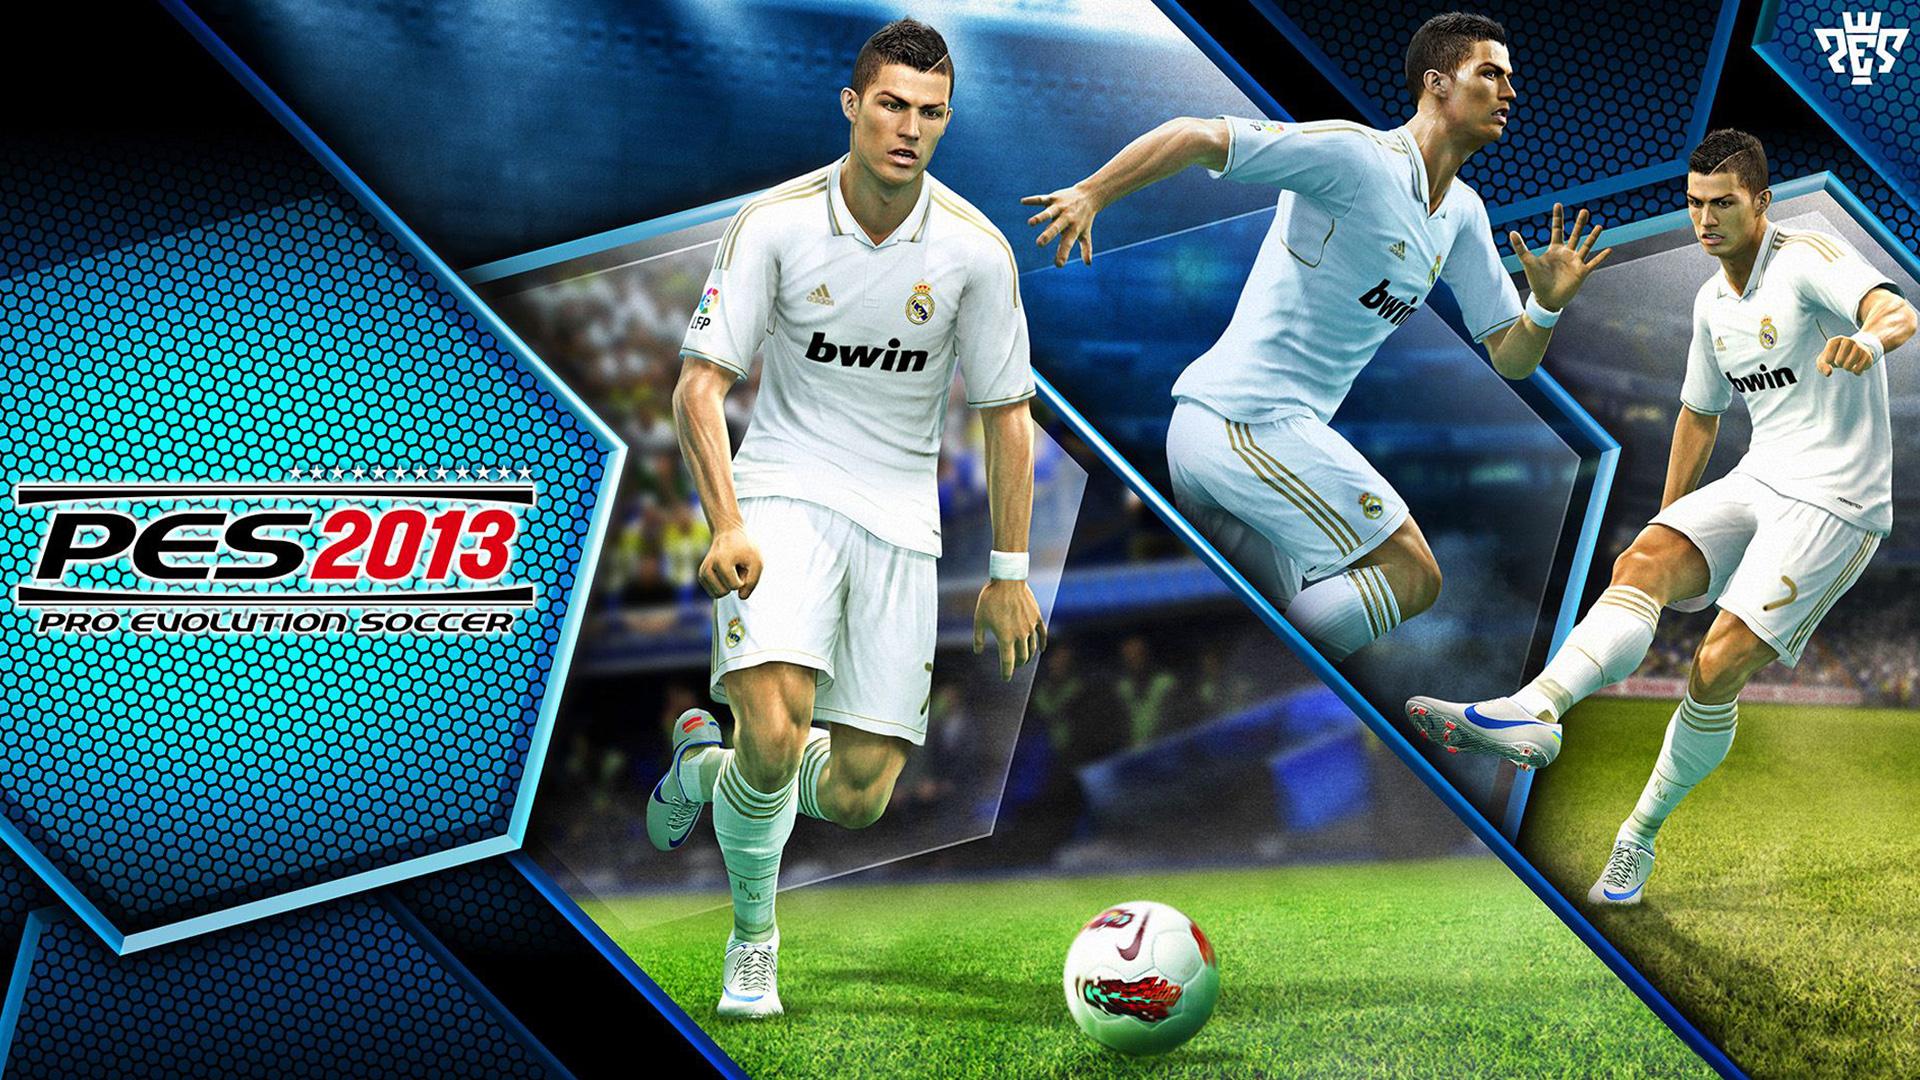 Pro Evolution Soccer 2013 Wallpaper in 1920x1080